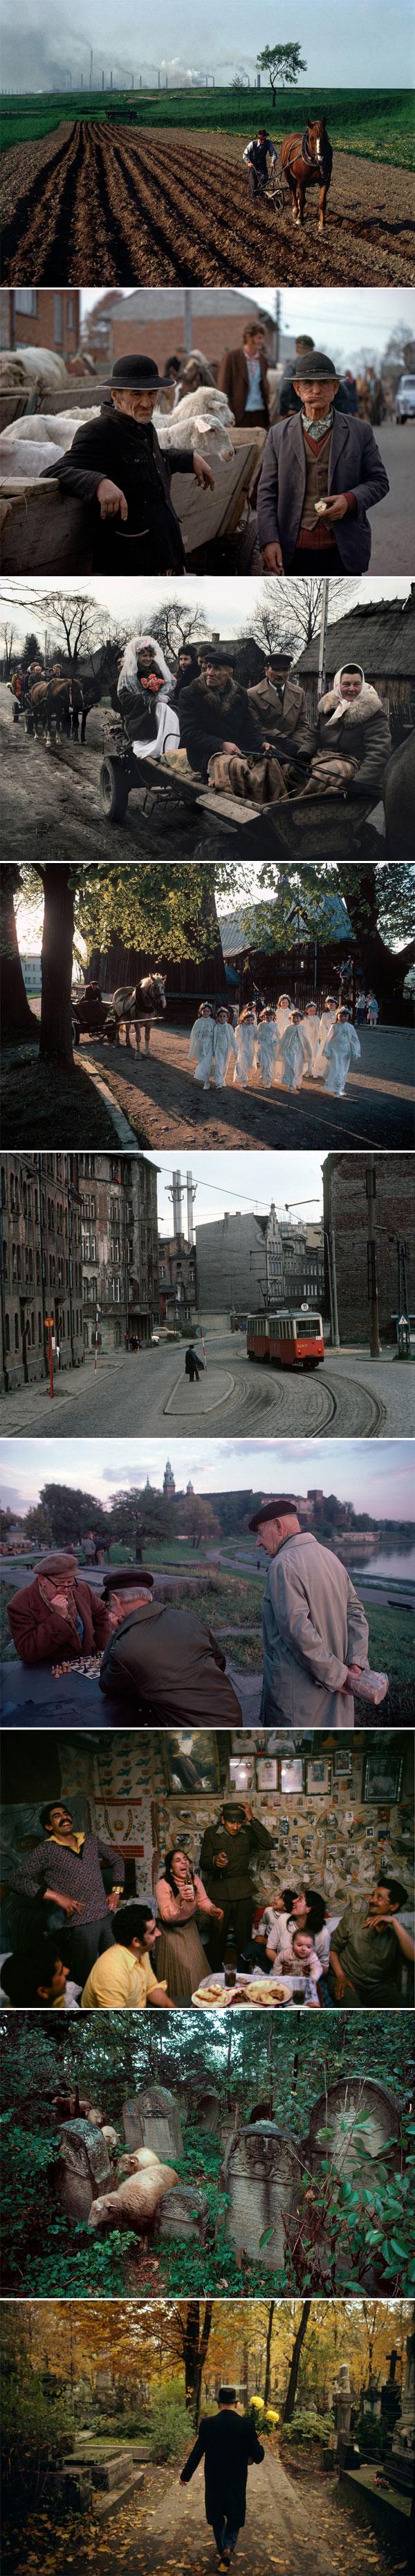 Polônia por Bruno Barbey | fotojornalismo